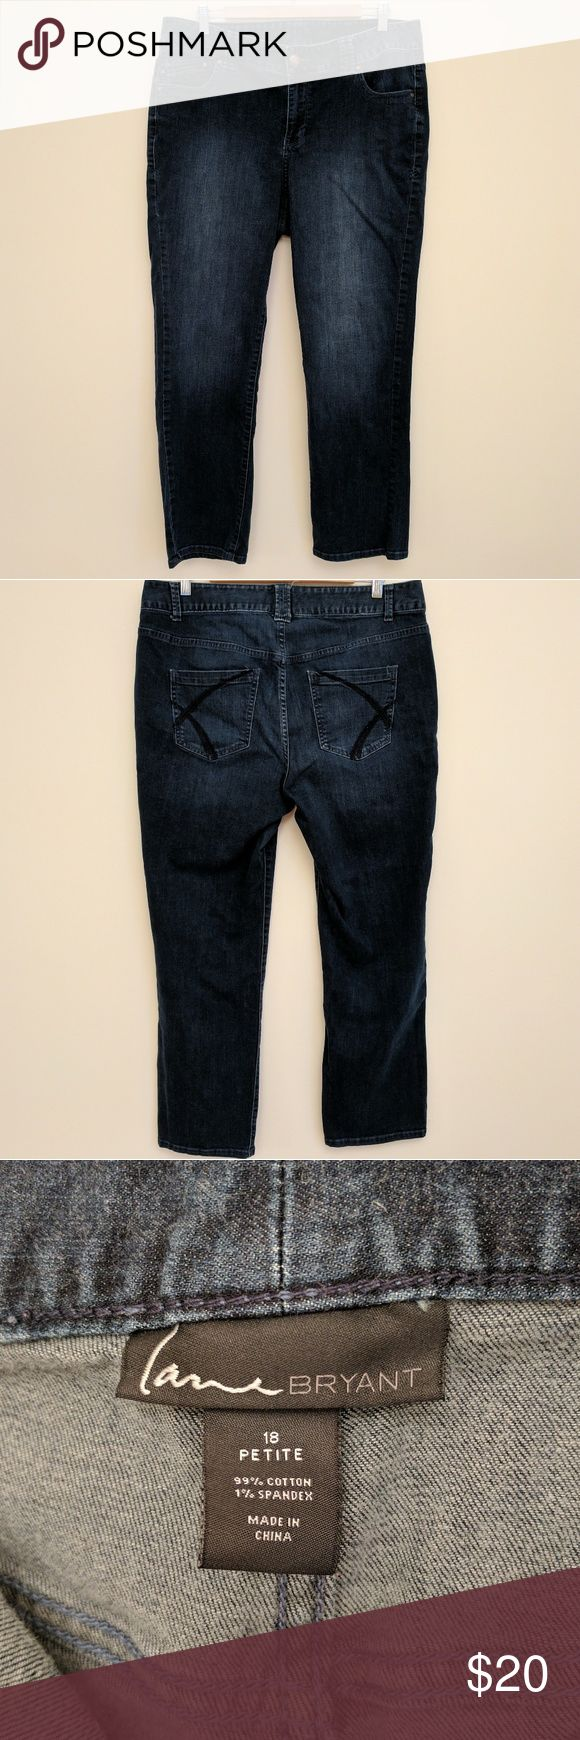 Lane Bryant petite length straight leg jeans Lane Bryant petite length straight leg jeans.  Dark rinse.  Excellent used condition.  Smoke free, pet free home.  ***Make me an offer!*** Lane Bryant Jeans Straight Leg